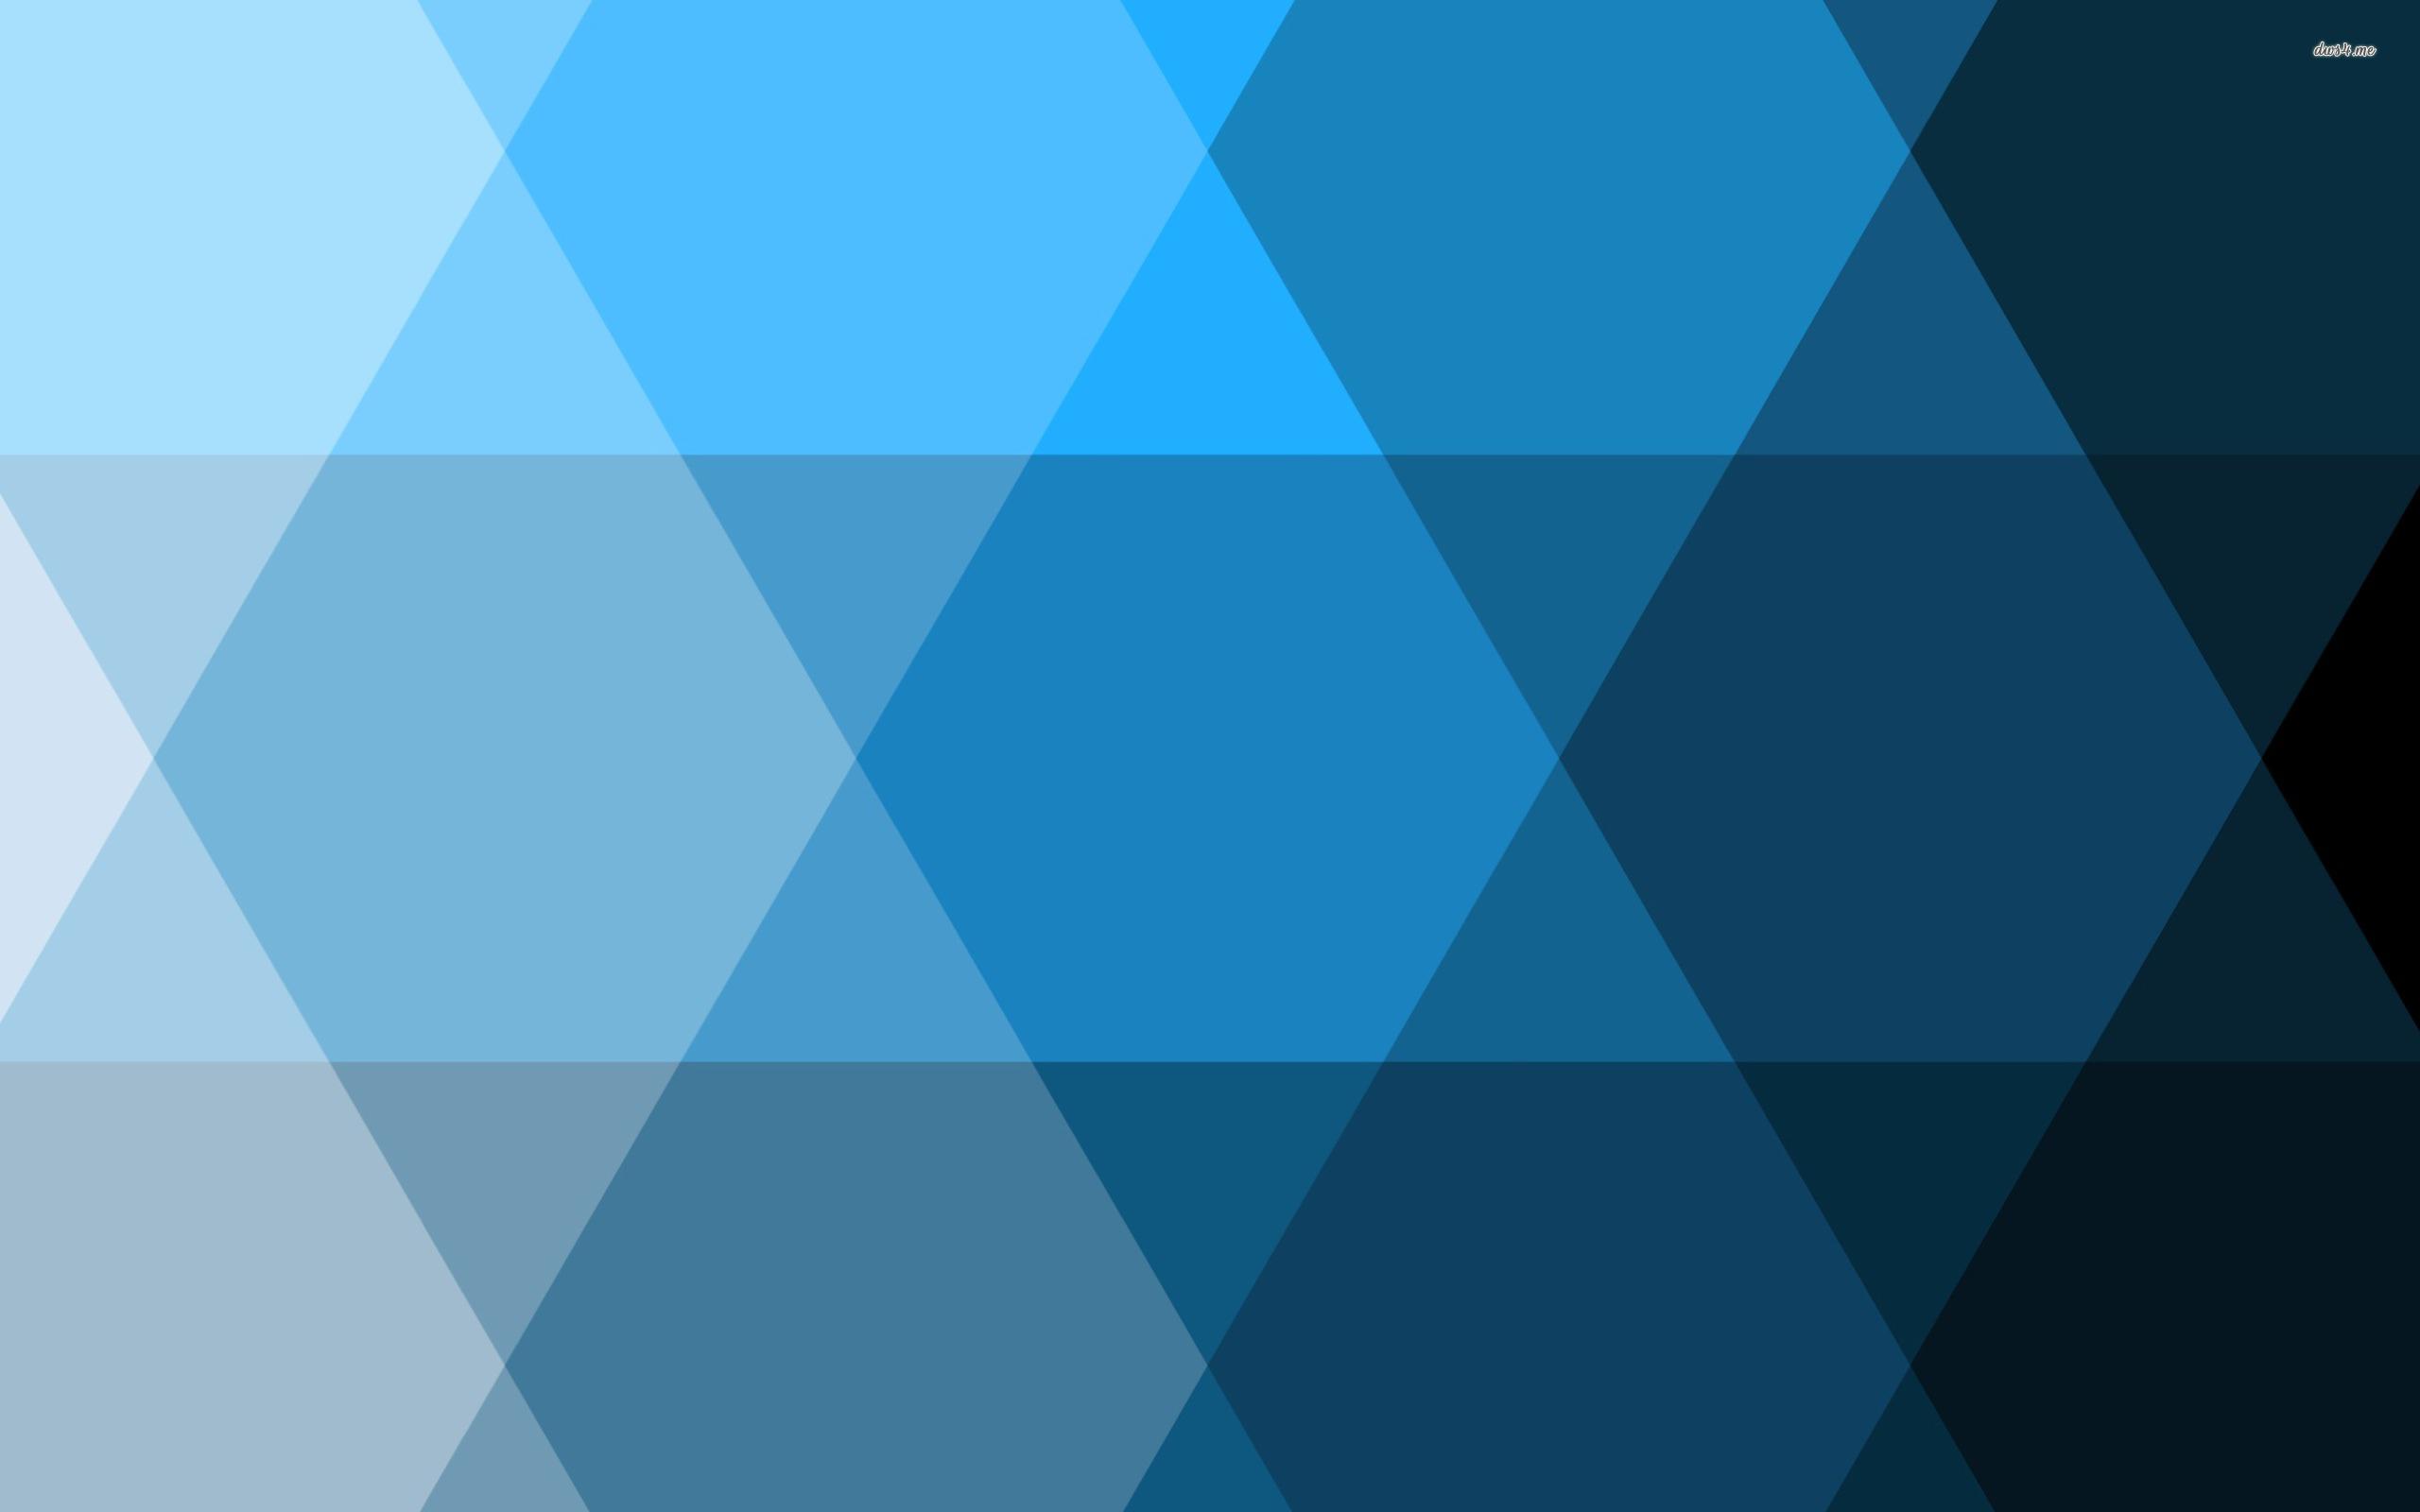 2560x1600 Blue Diamond Pattern Hd Wallpaper Vector Desktop Wallpaper